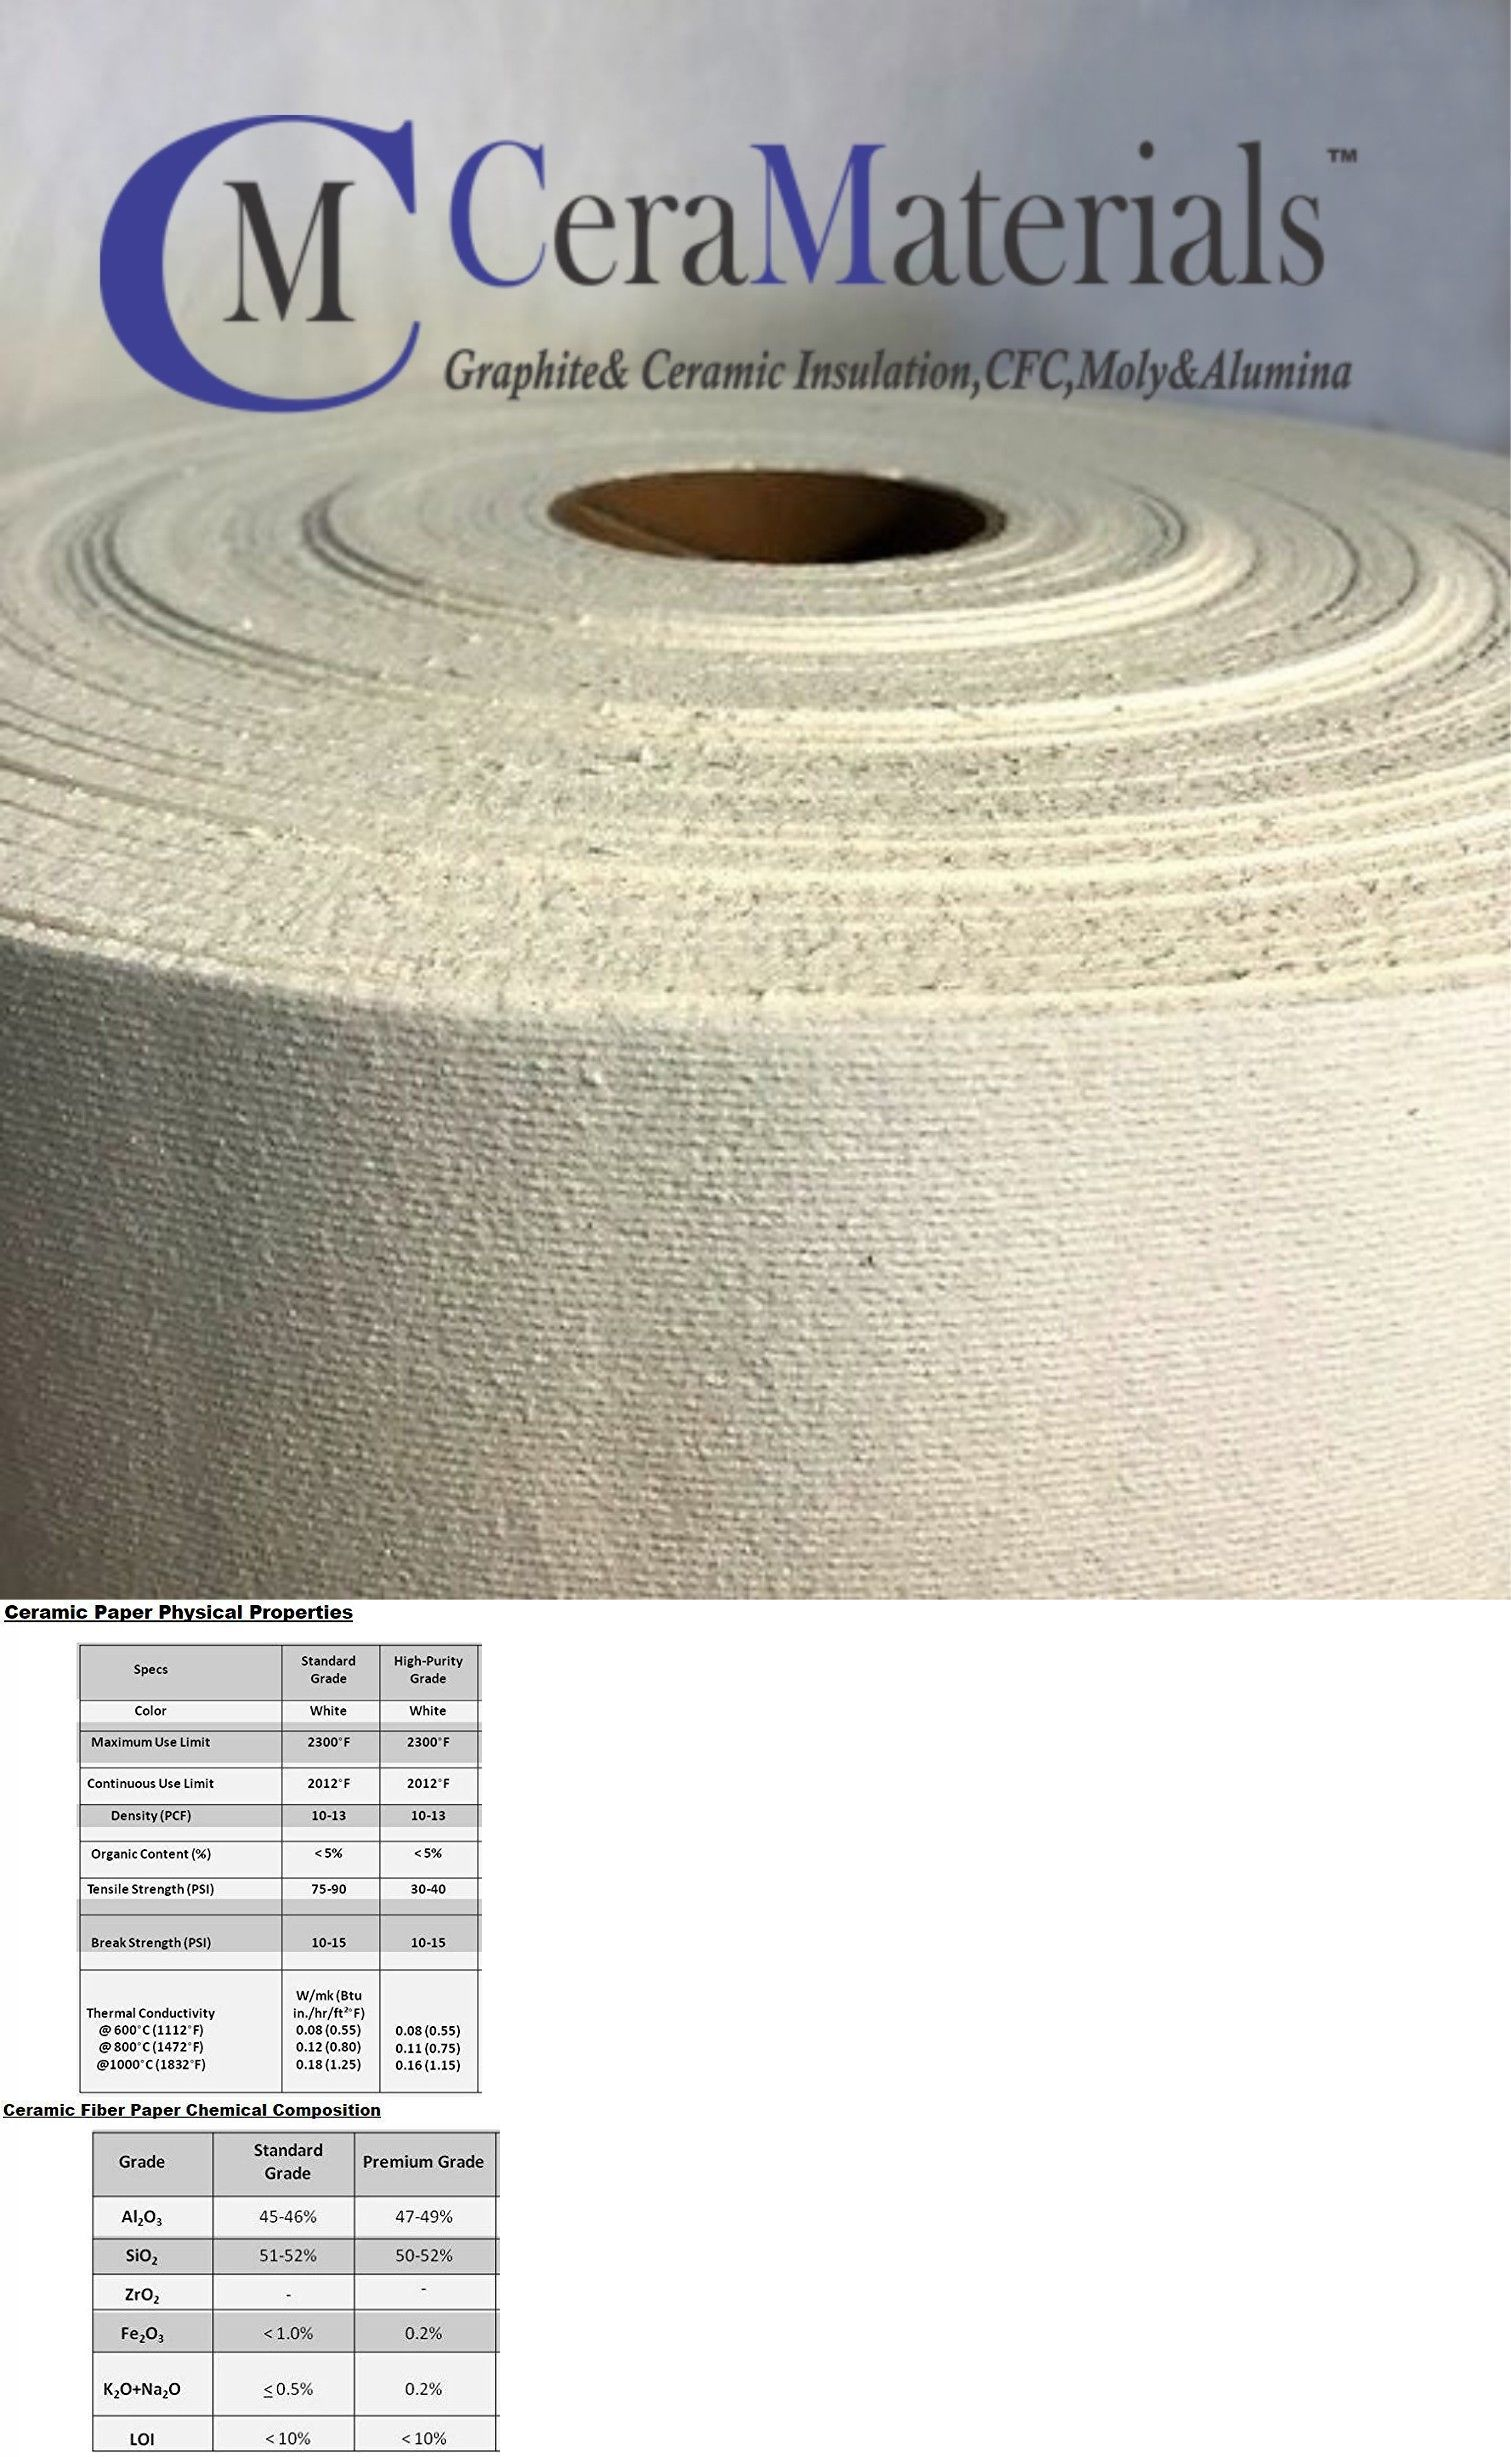 Details About Kaowool Ceramic Fiber Paper 1 4 X 48 X 12 5 500 Grade Thermal Ceramics 2300f Ceramic Fiber Ceramics Fiber